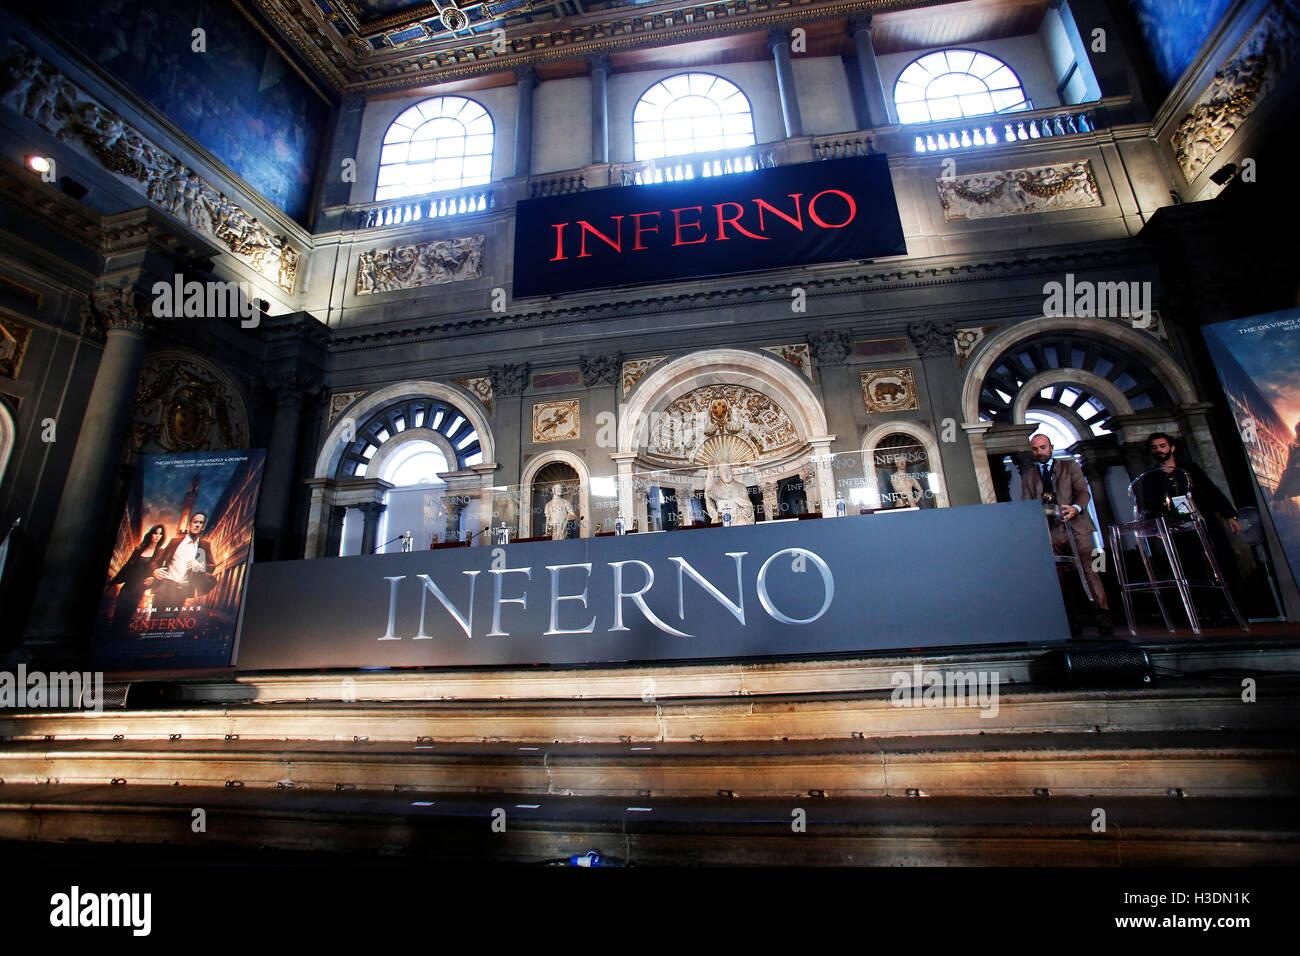 Florence, Italie. 6 octobre, 2016. Florence 6 octobre 2016. 'Inferno' Photocall, première mondiale. Photo Stock